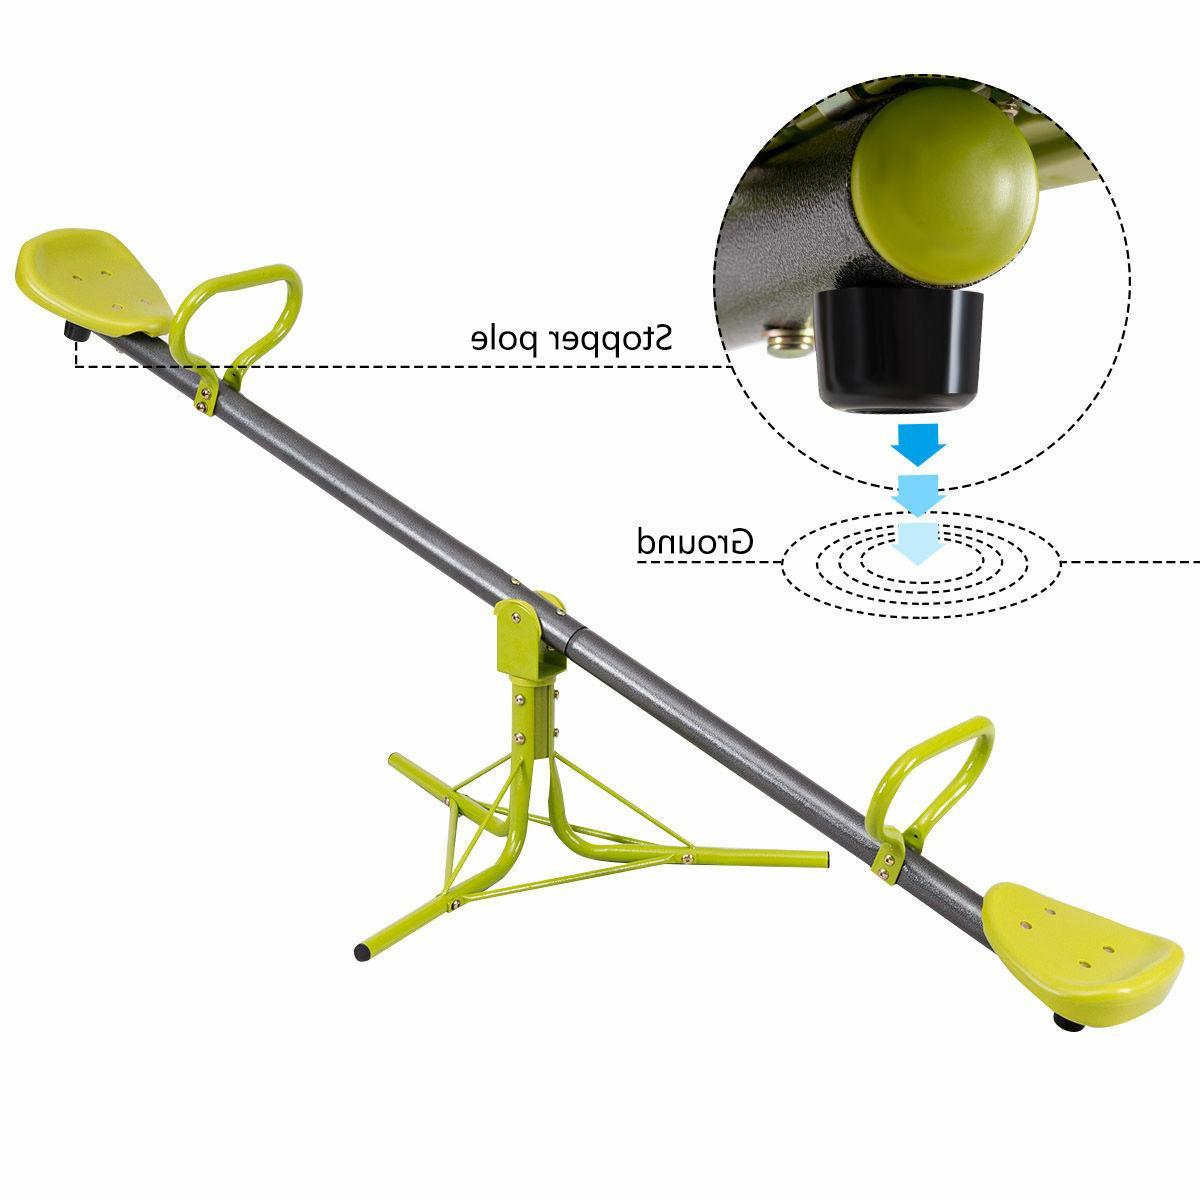 360 degree rotation outdoor kids seesaw teeter